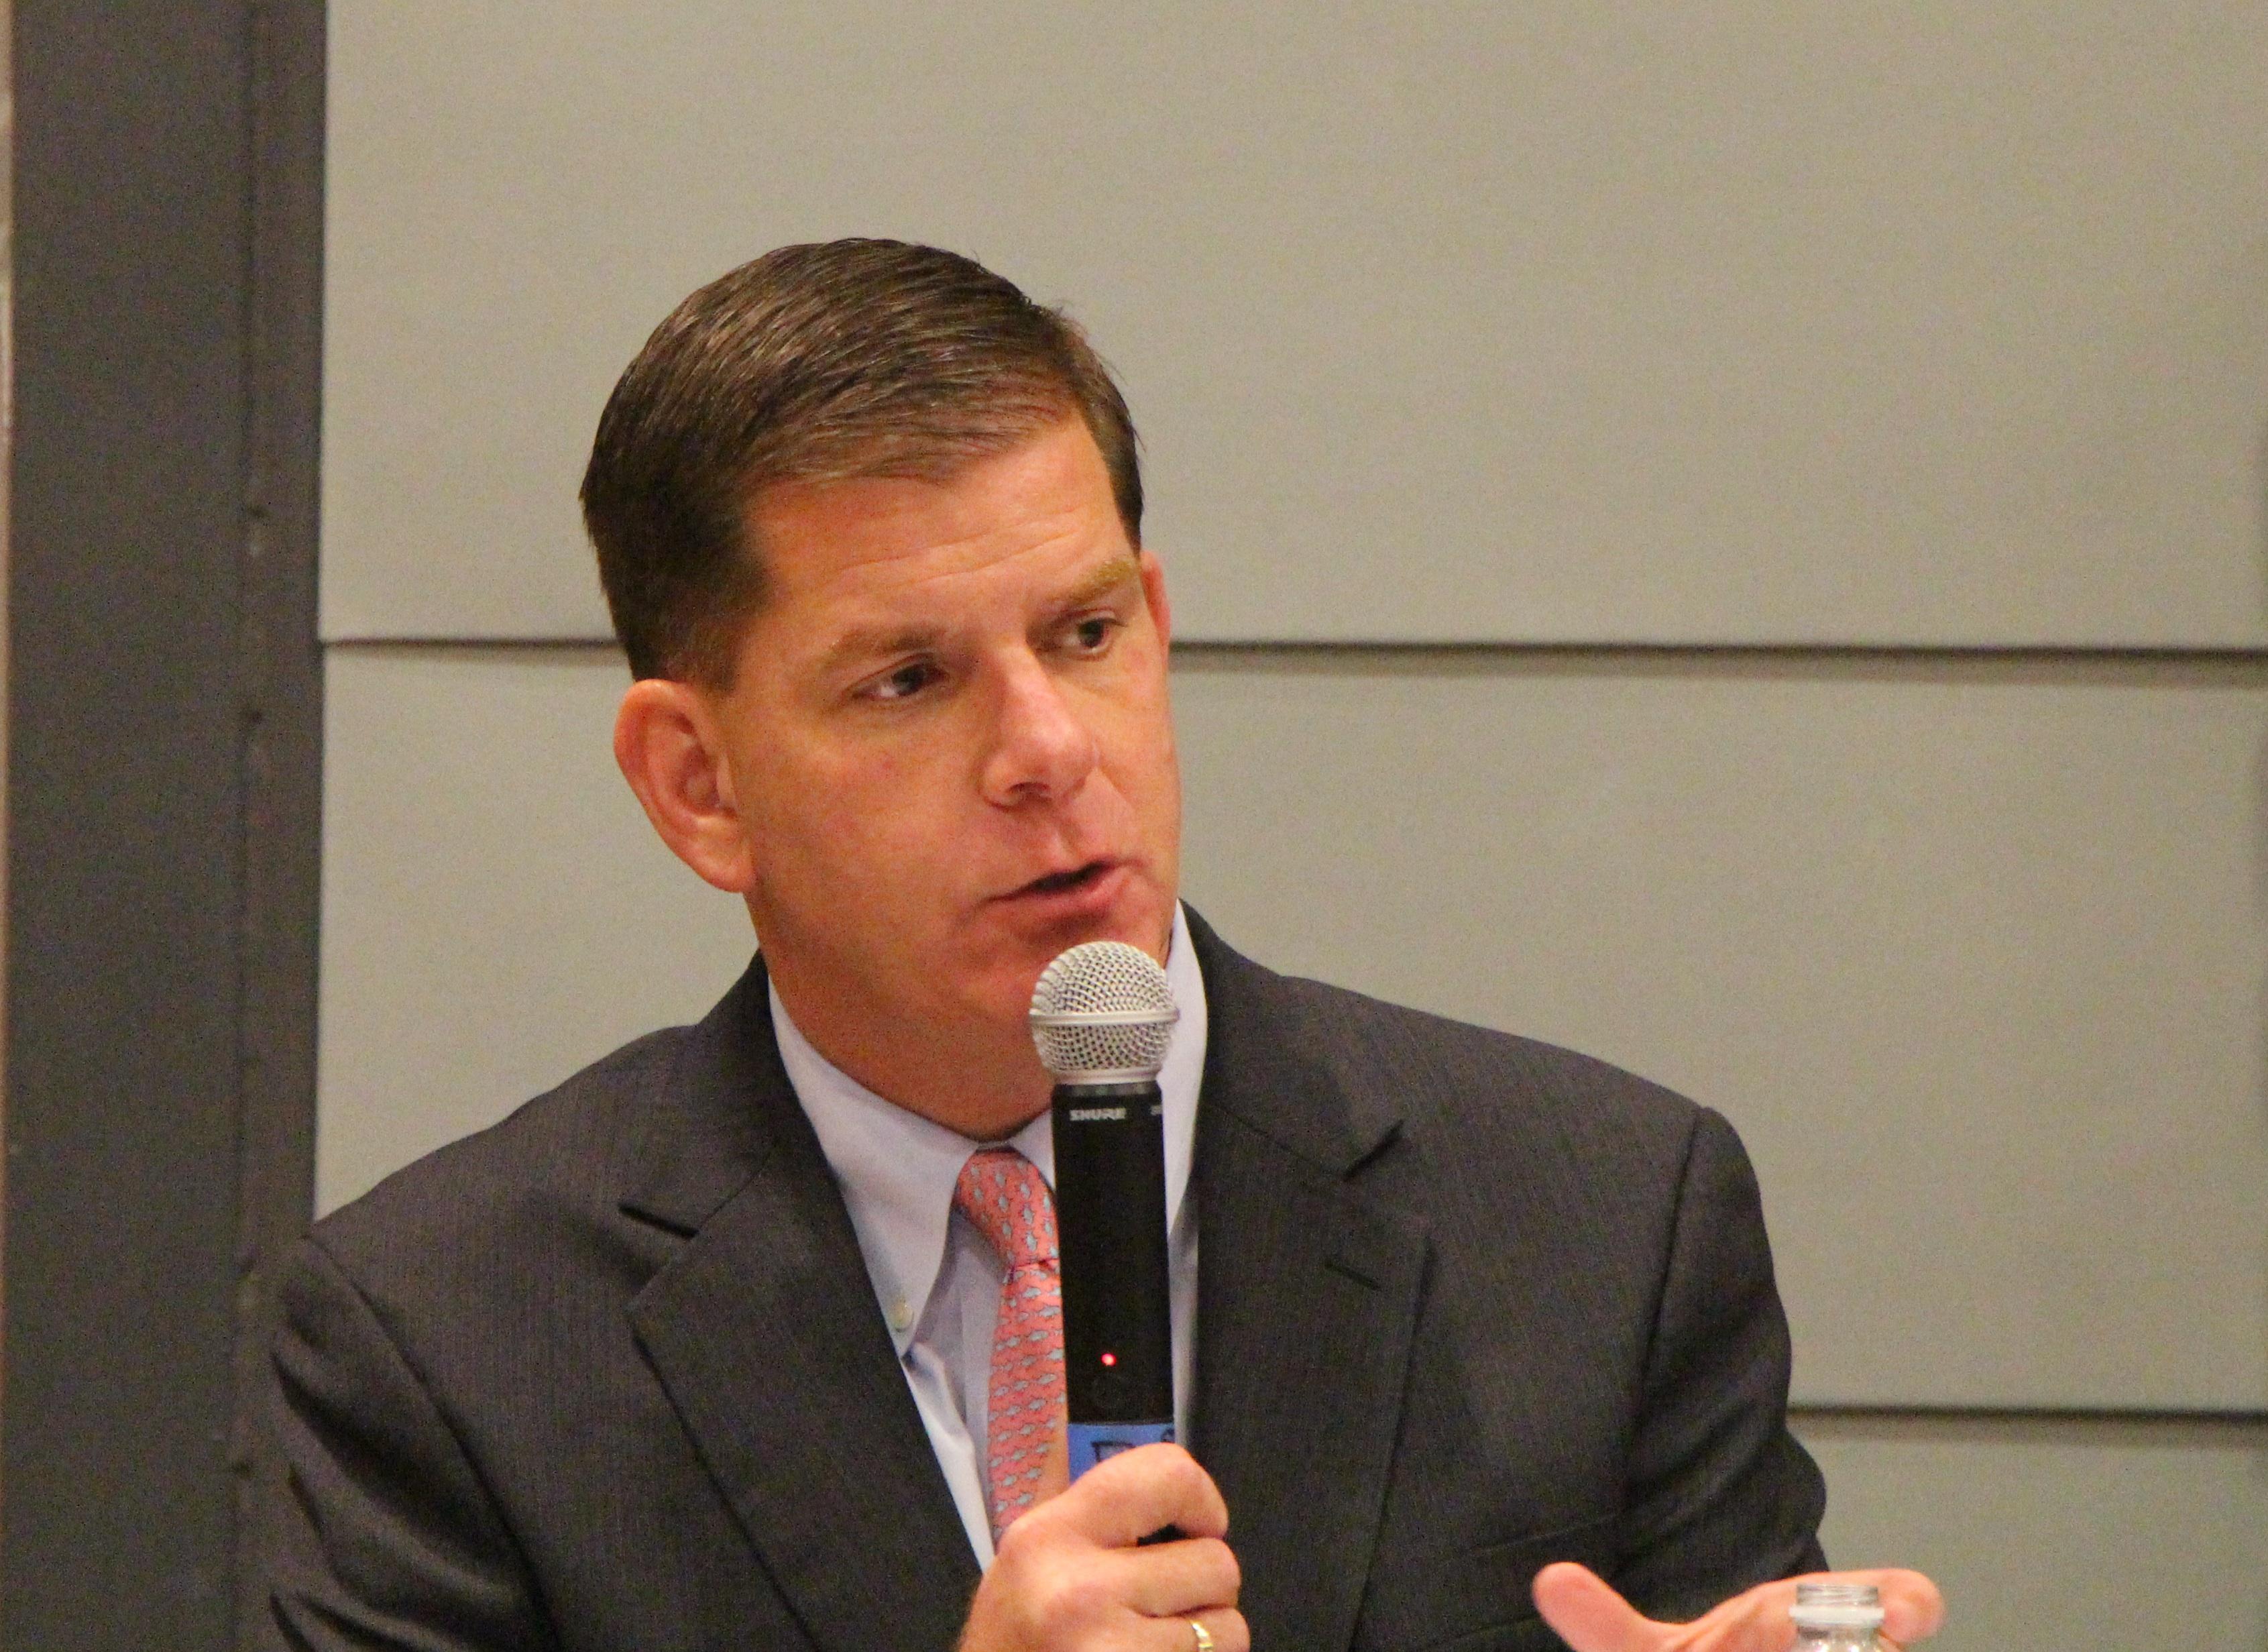 Boston Mayor Marty Walsh failed to reach an agreement with Wynn Resorts over the Wynn Everett casino project.